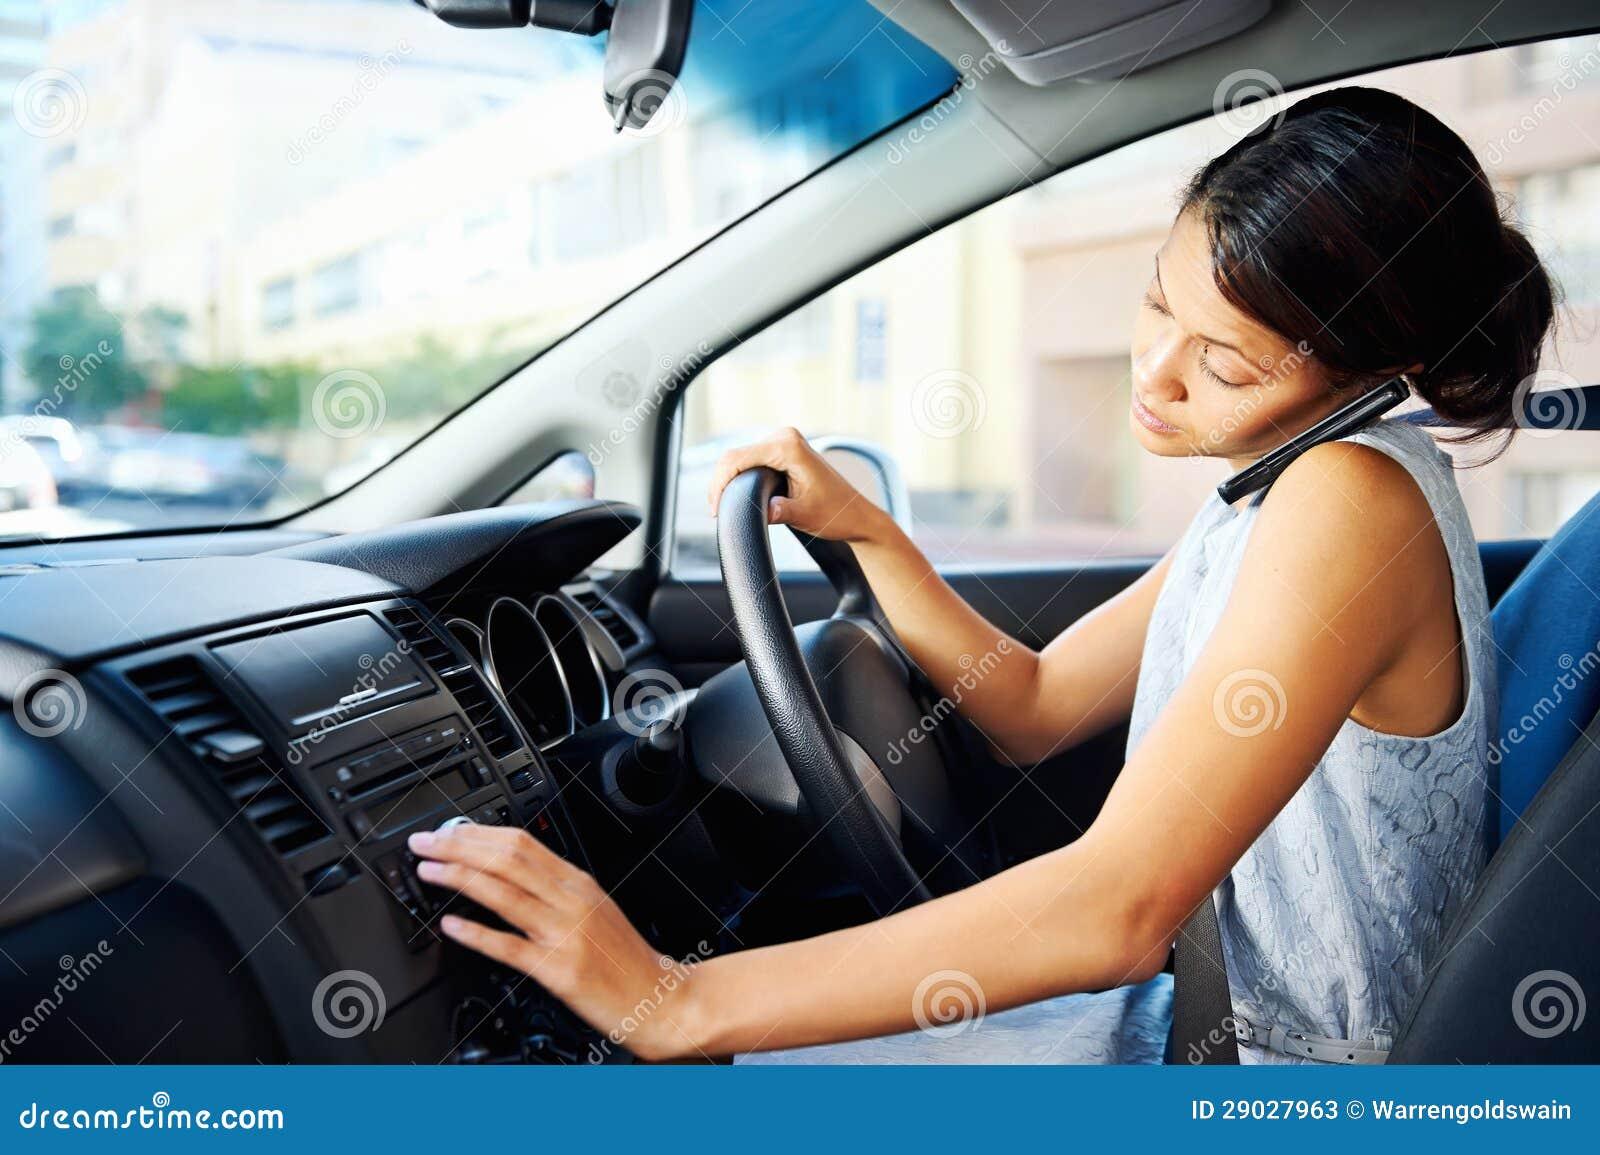 Teenage Driving Argumentative Essay